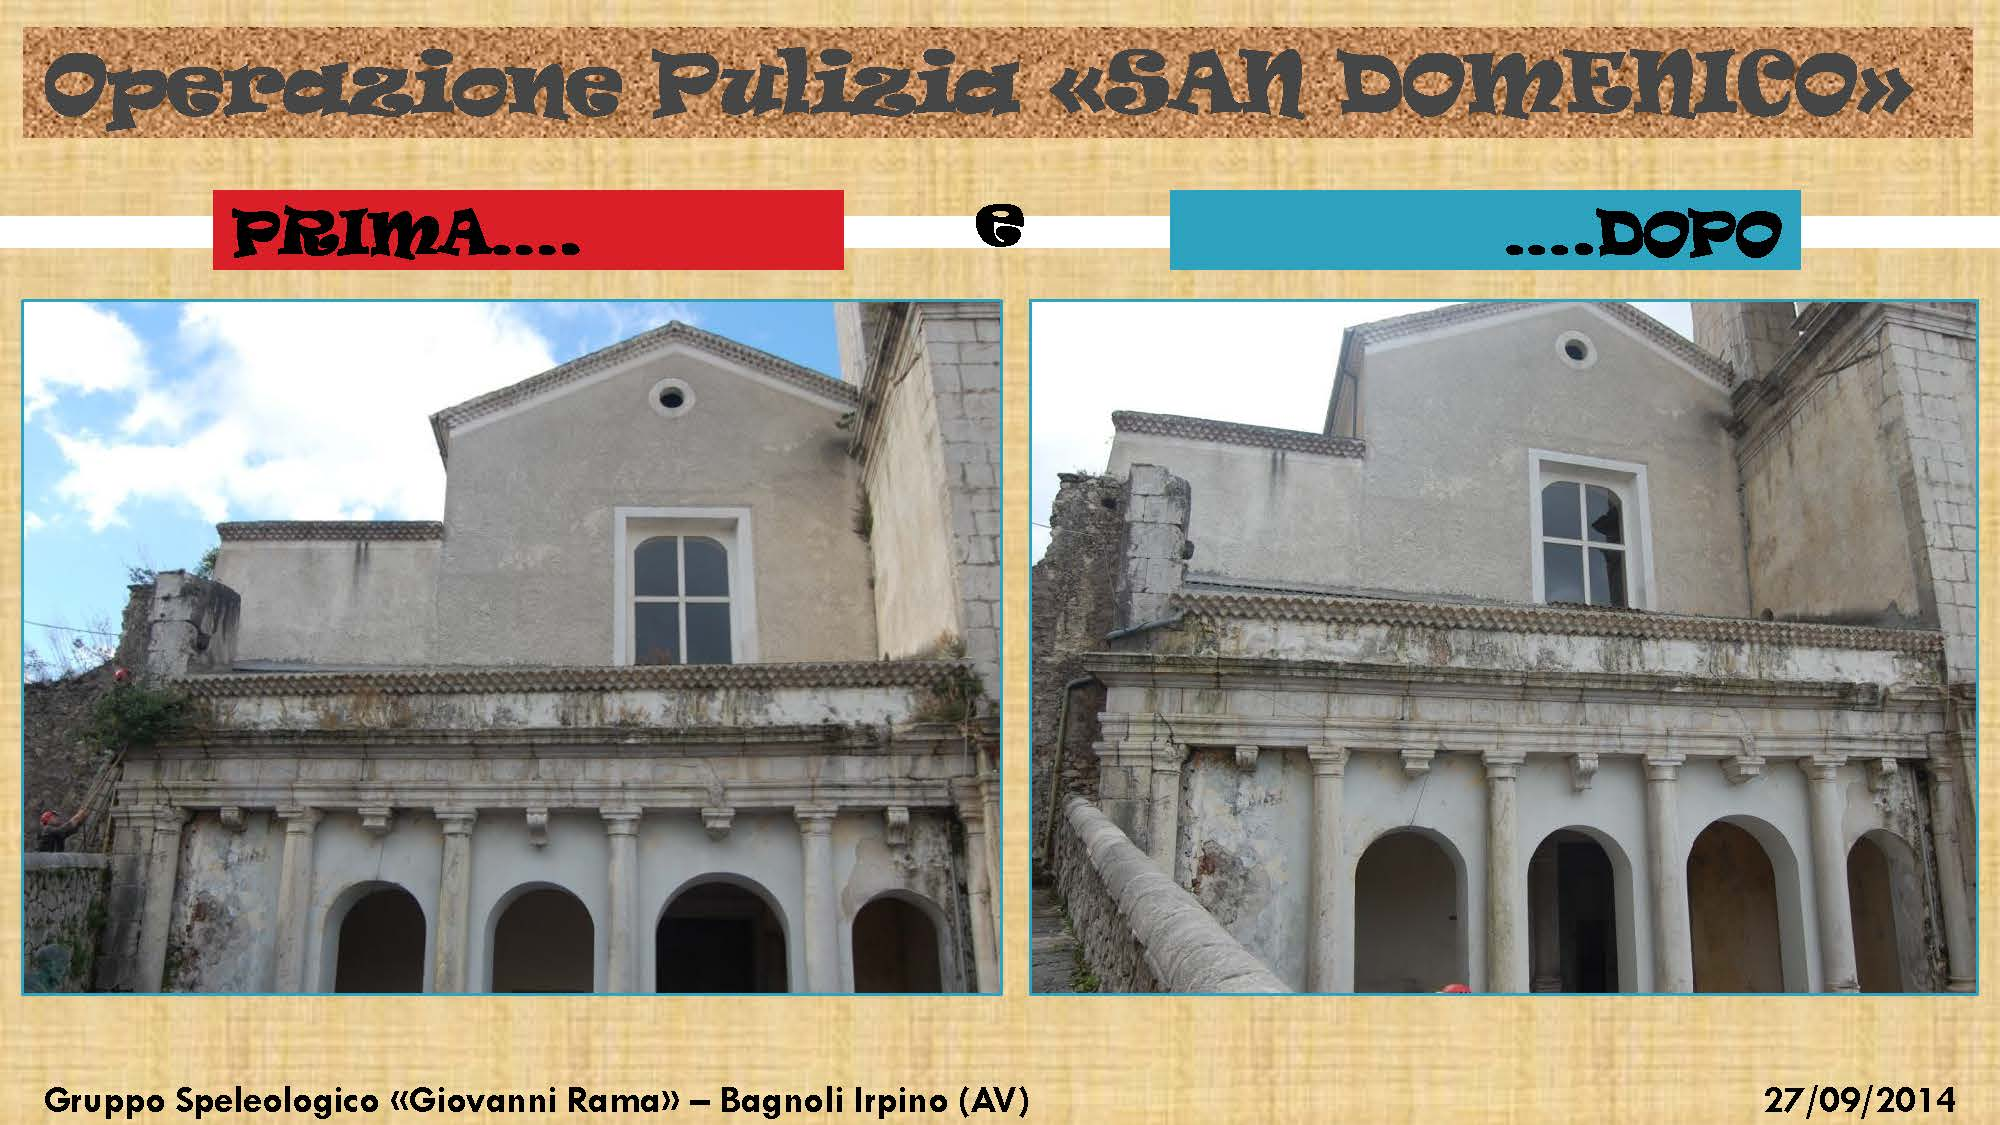 Bagnoli-Pulizia-San-Domenico-2014_Pagina_02